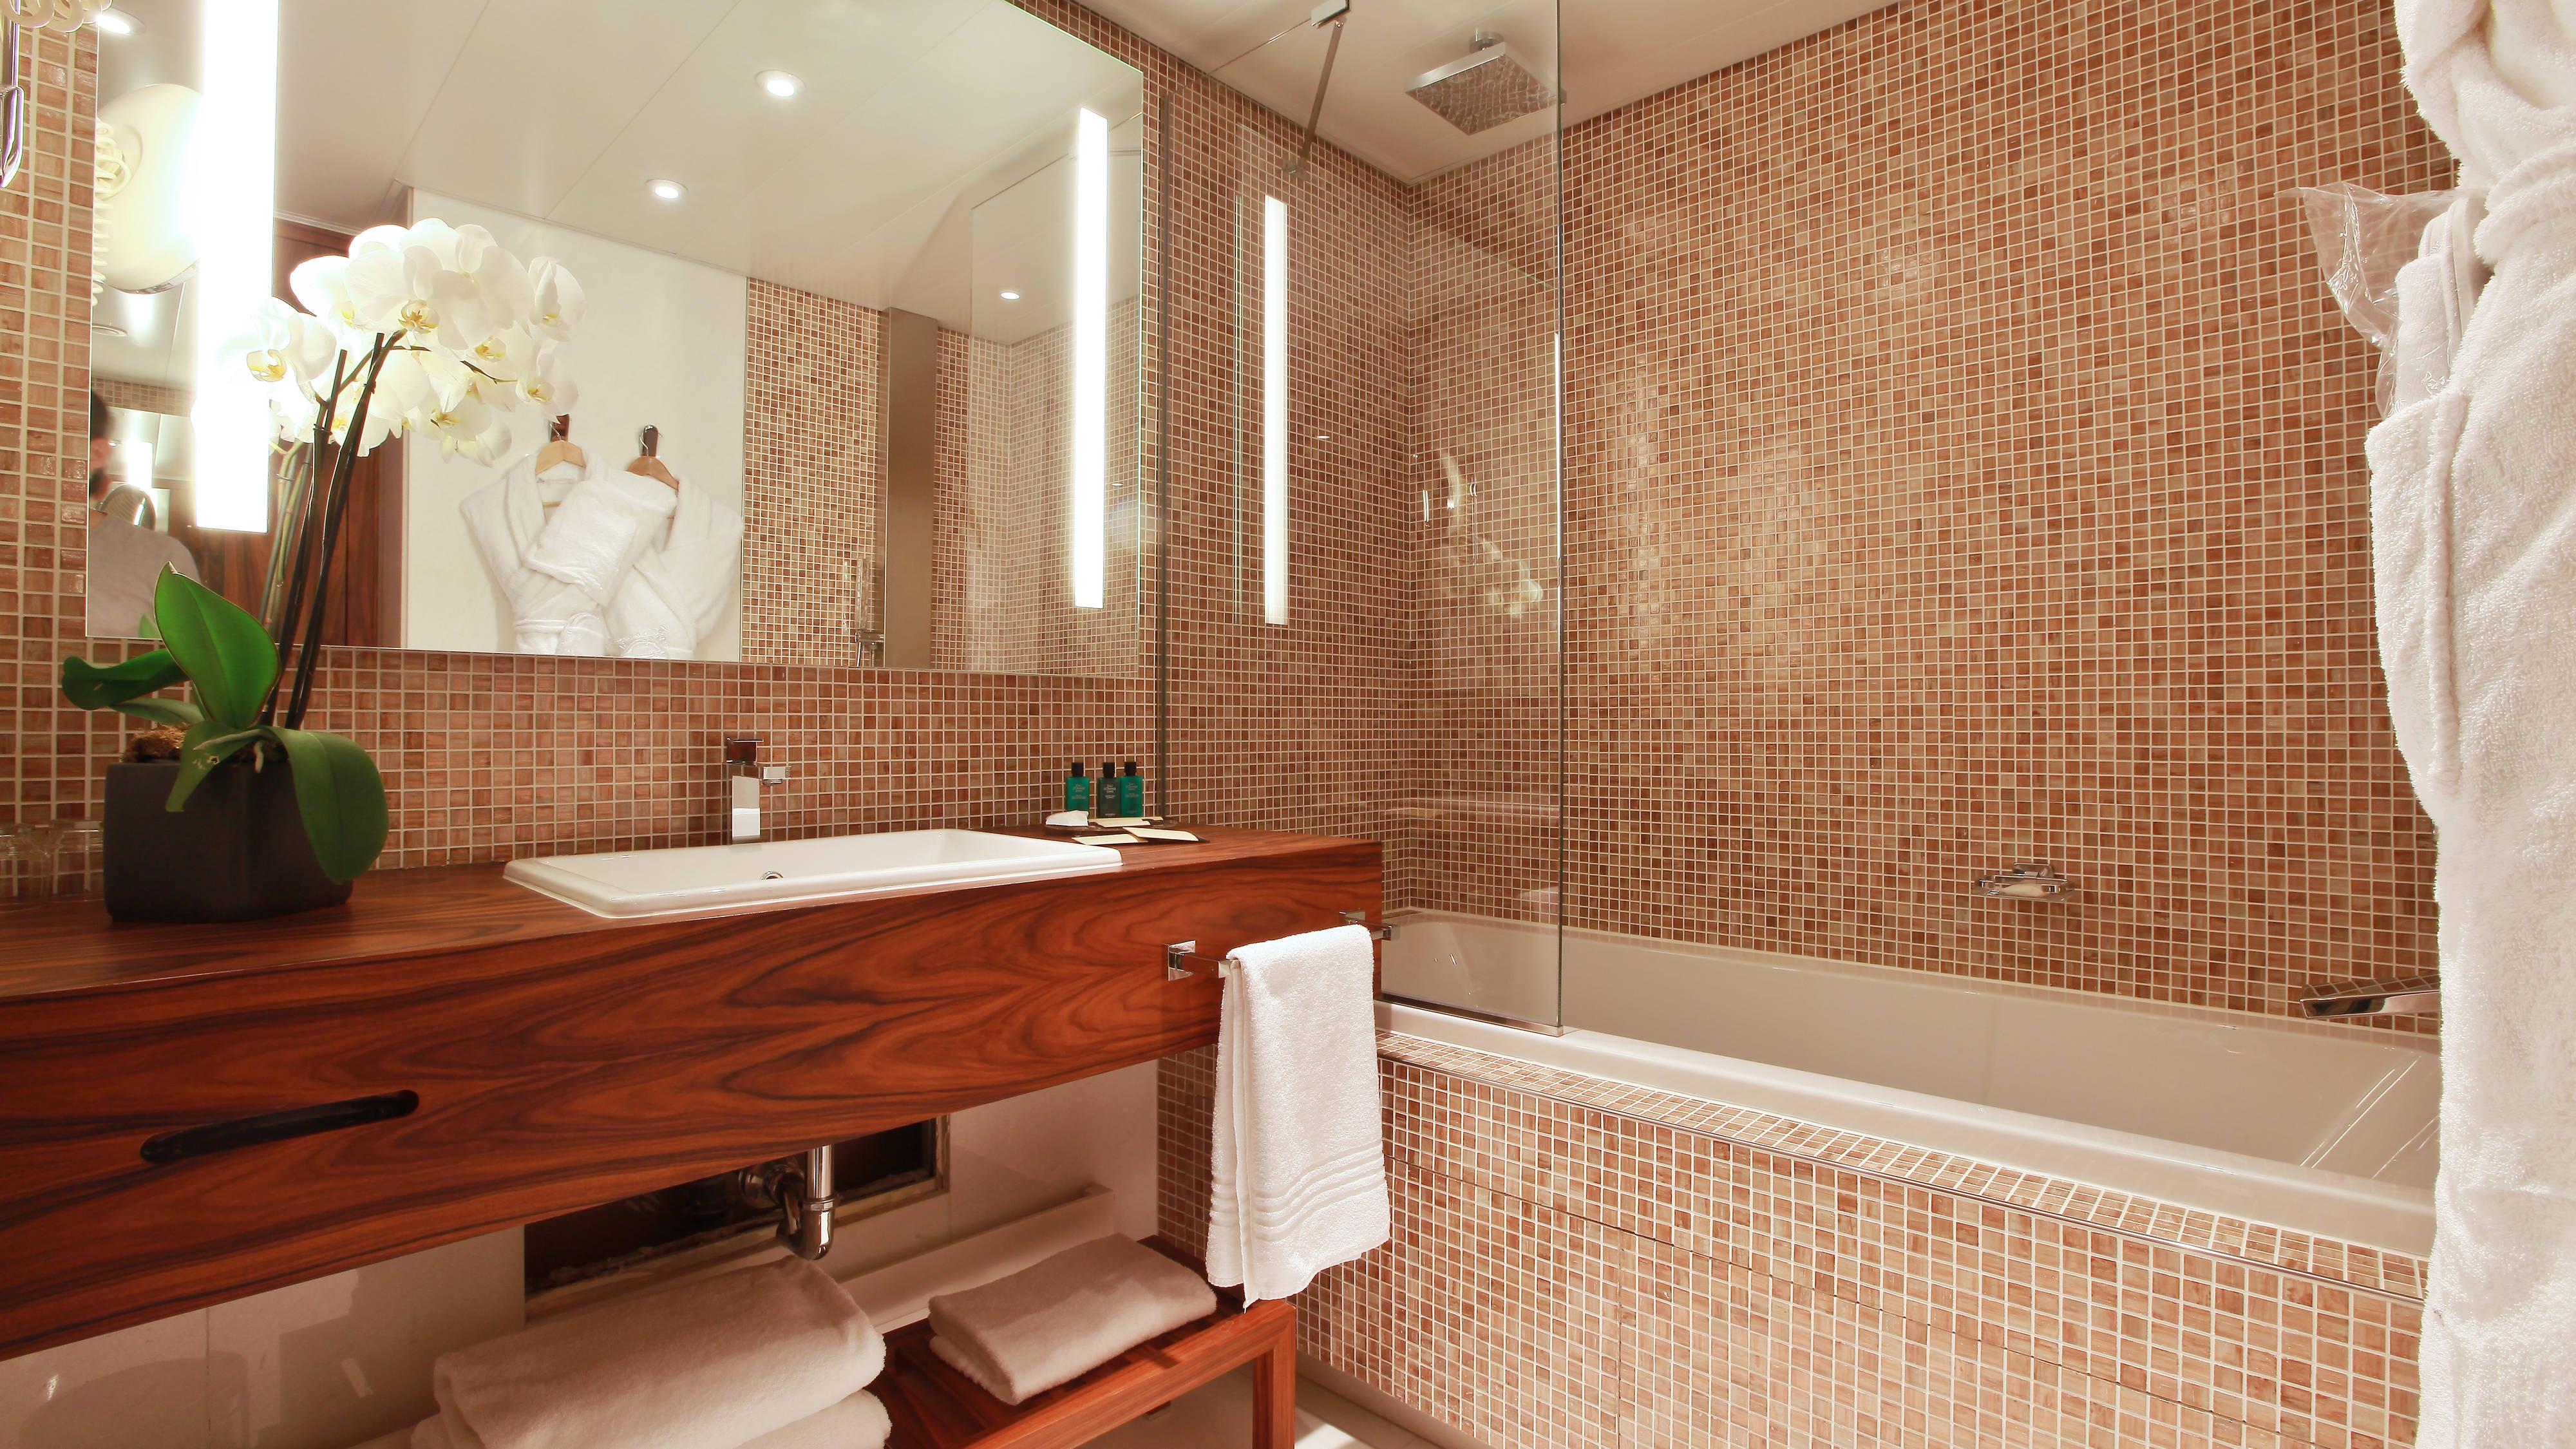 Cannes luxury hotel guest bathroom